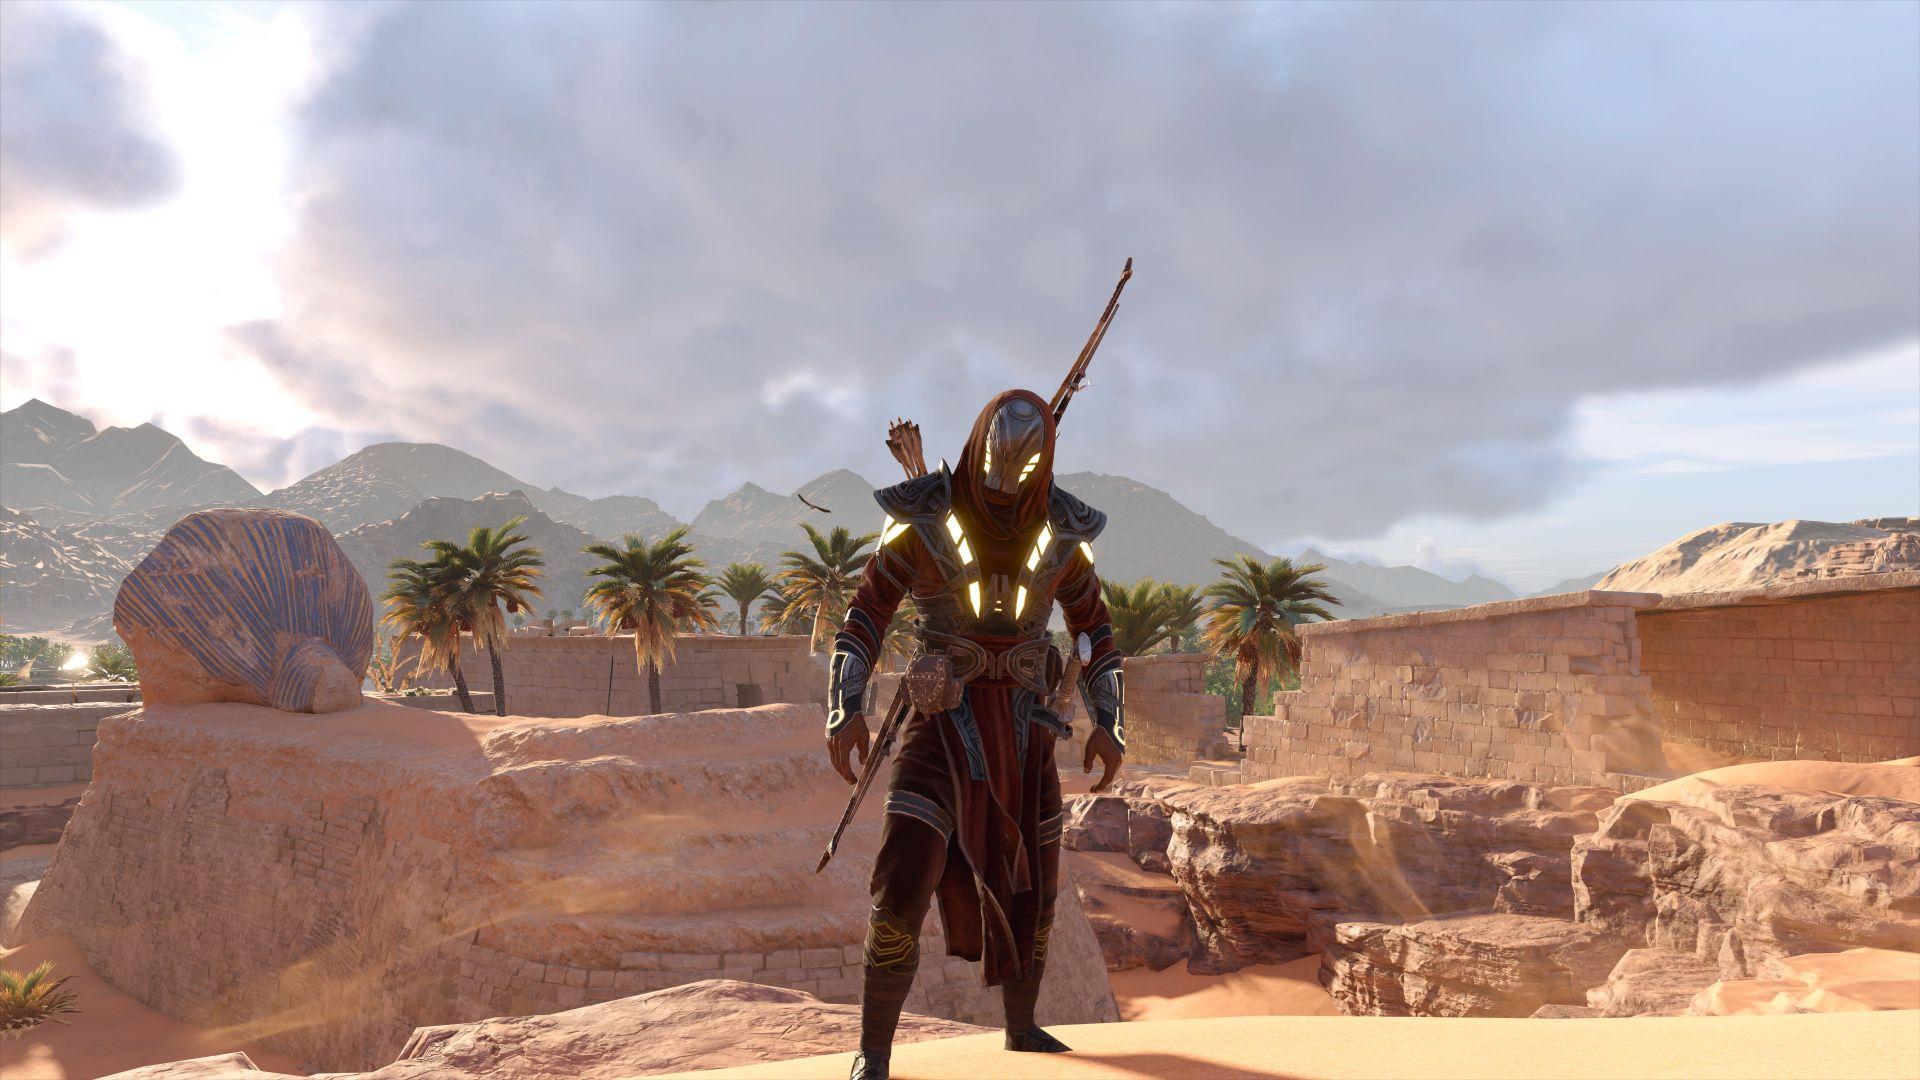 Desktop Wallpaper Assassin's Creed Origins, Desert, Video